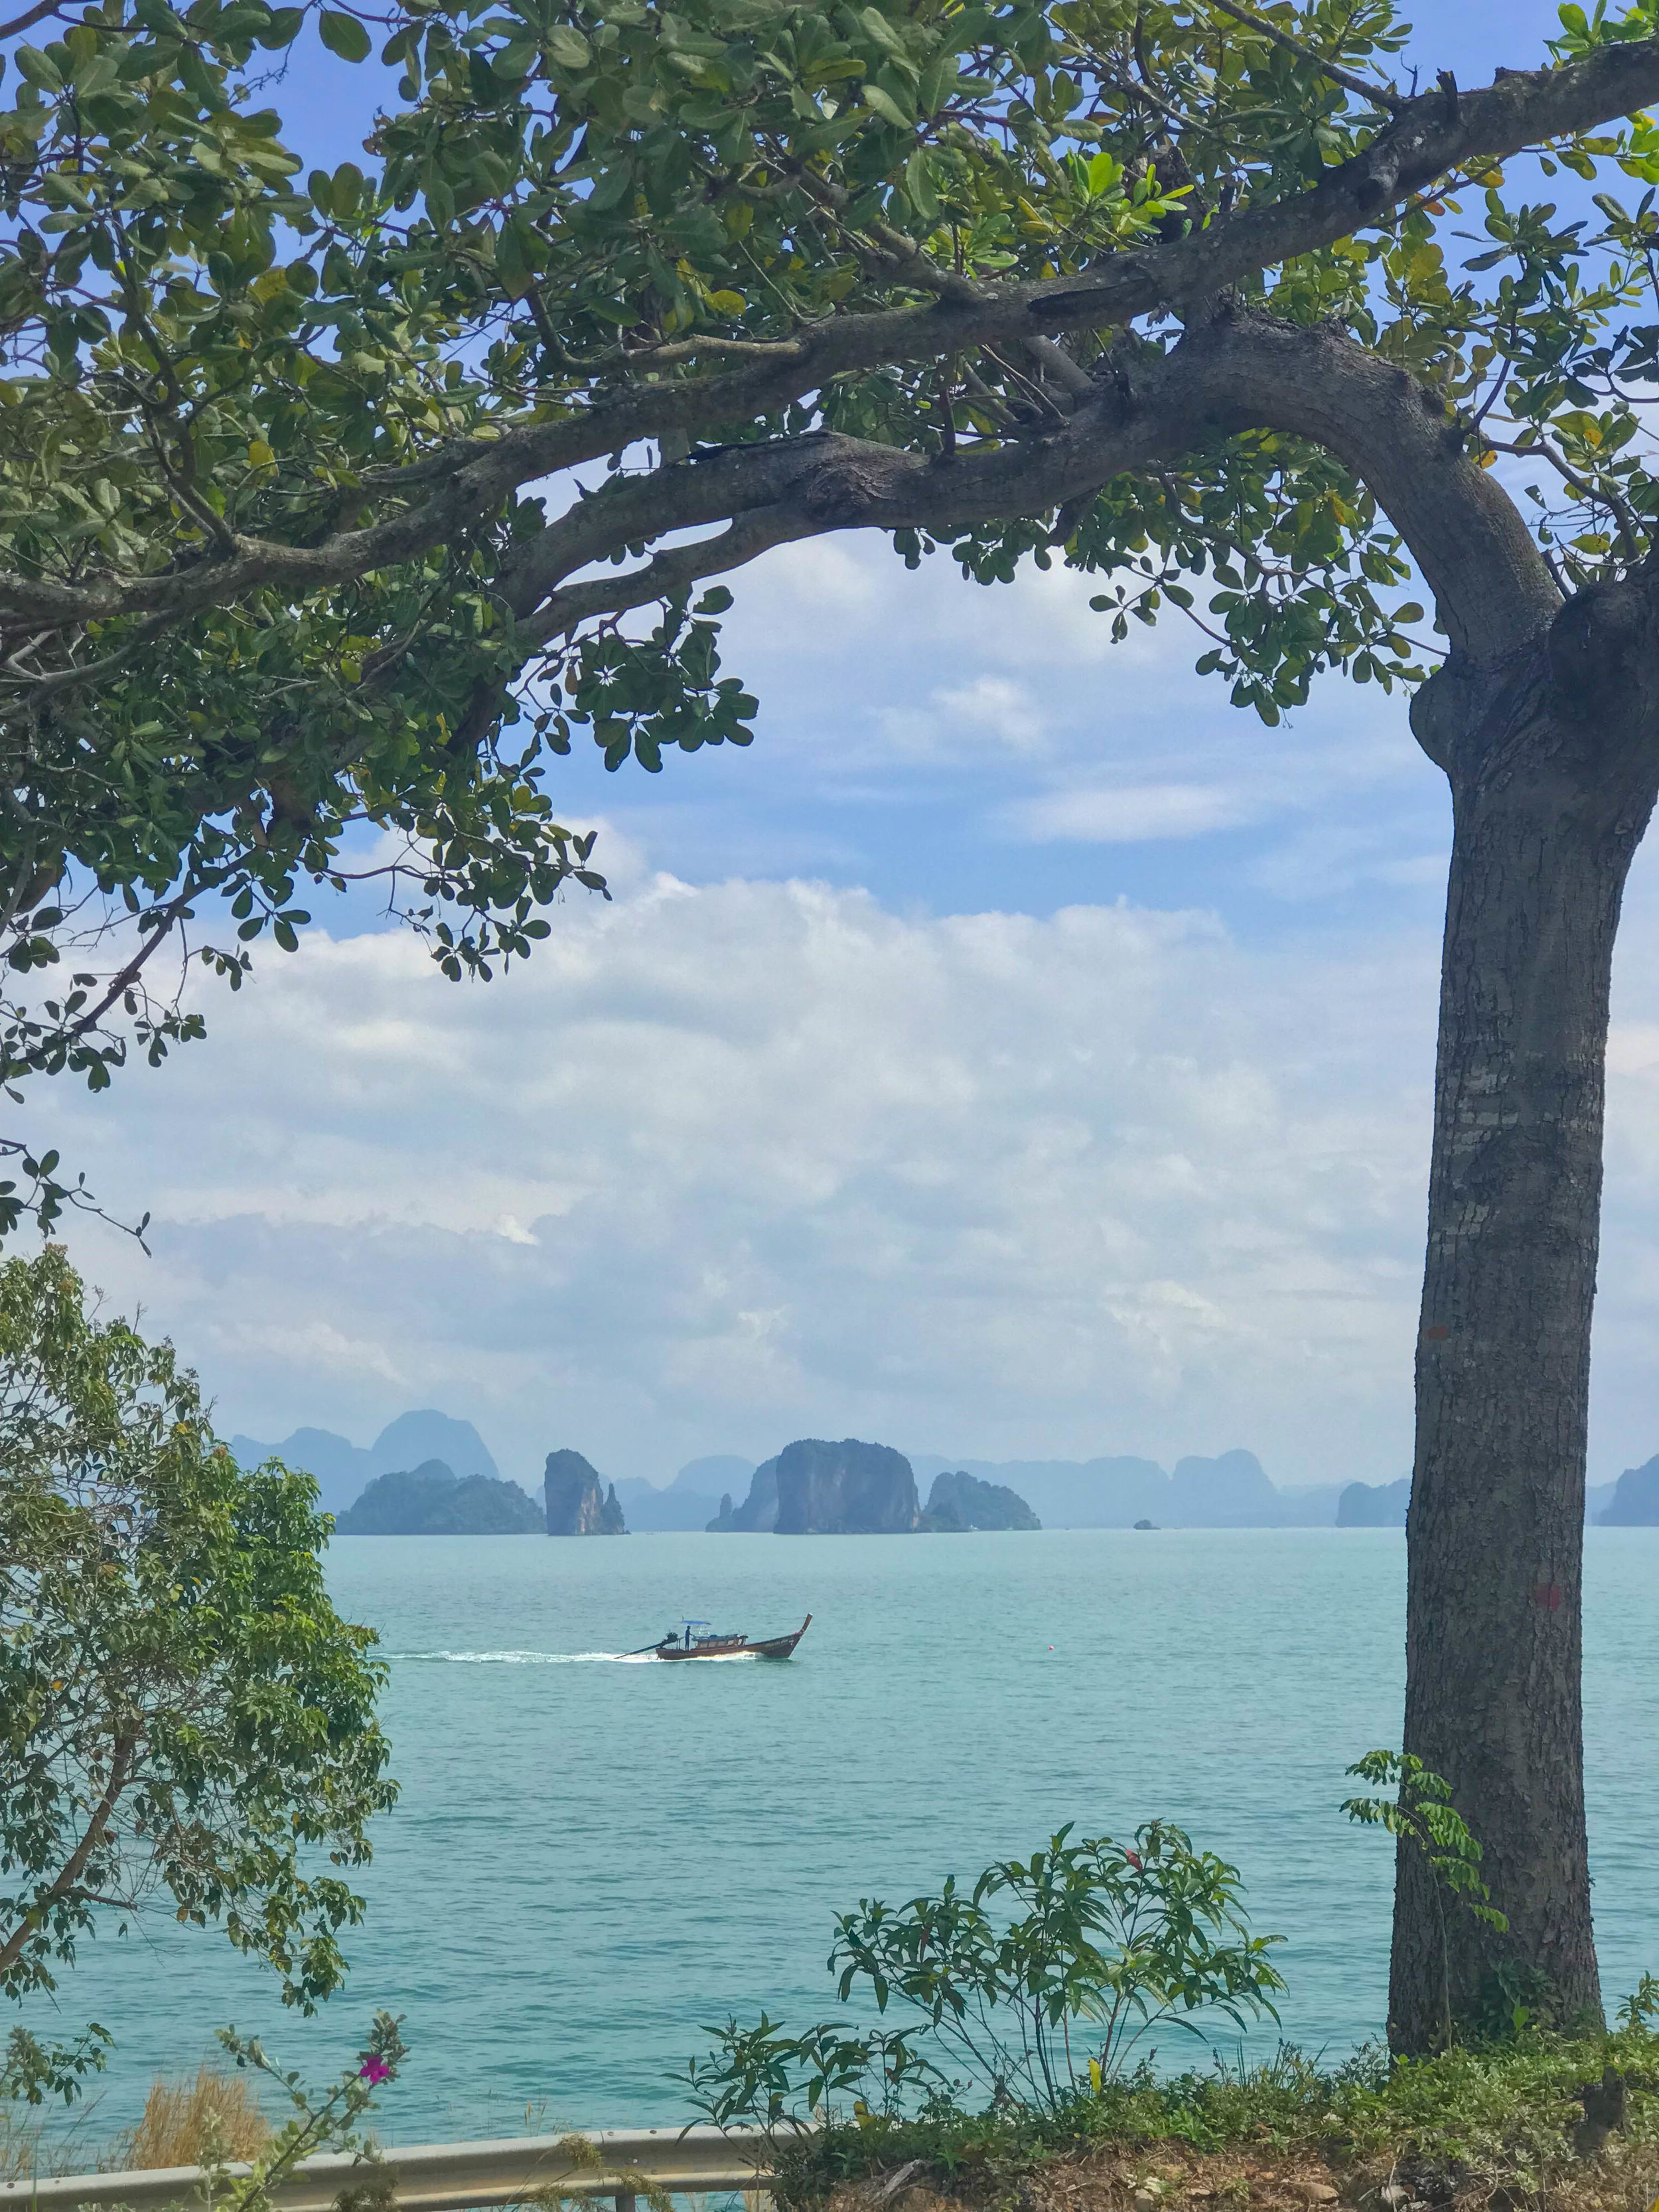 Thailand Cape Kudu Hotel Koh Yao Noi - Hotel views longtail boat